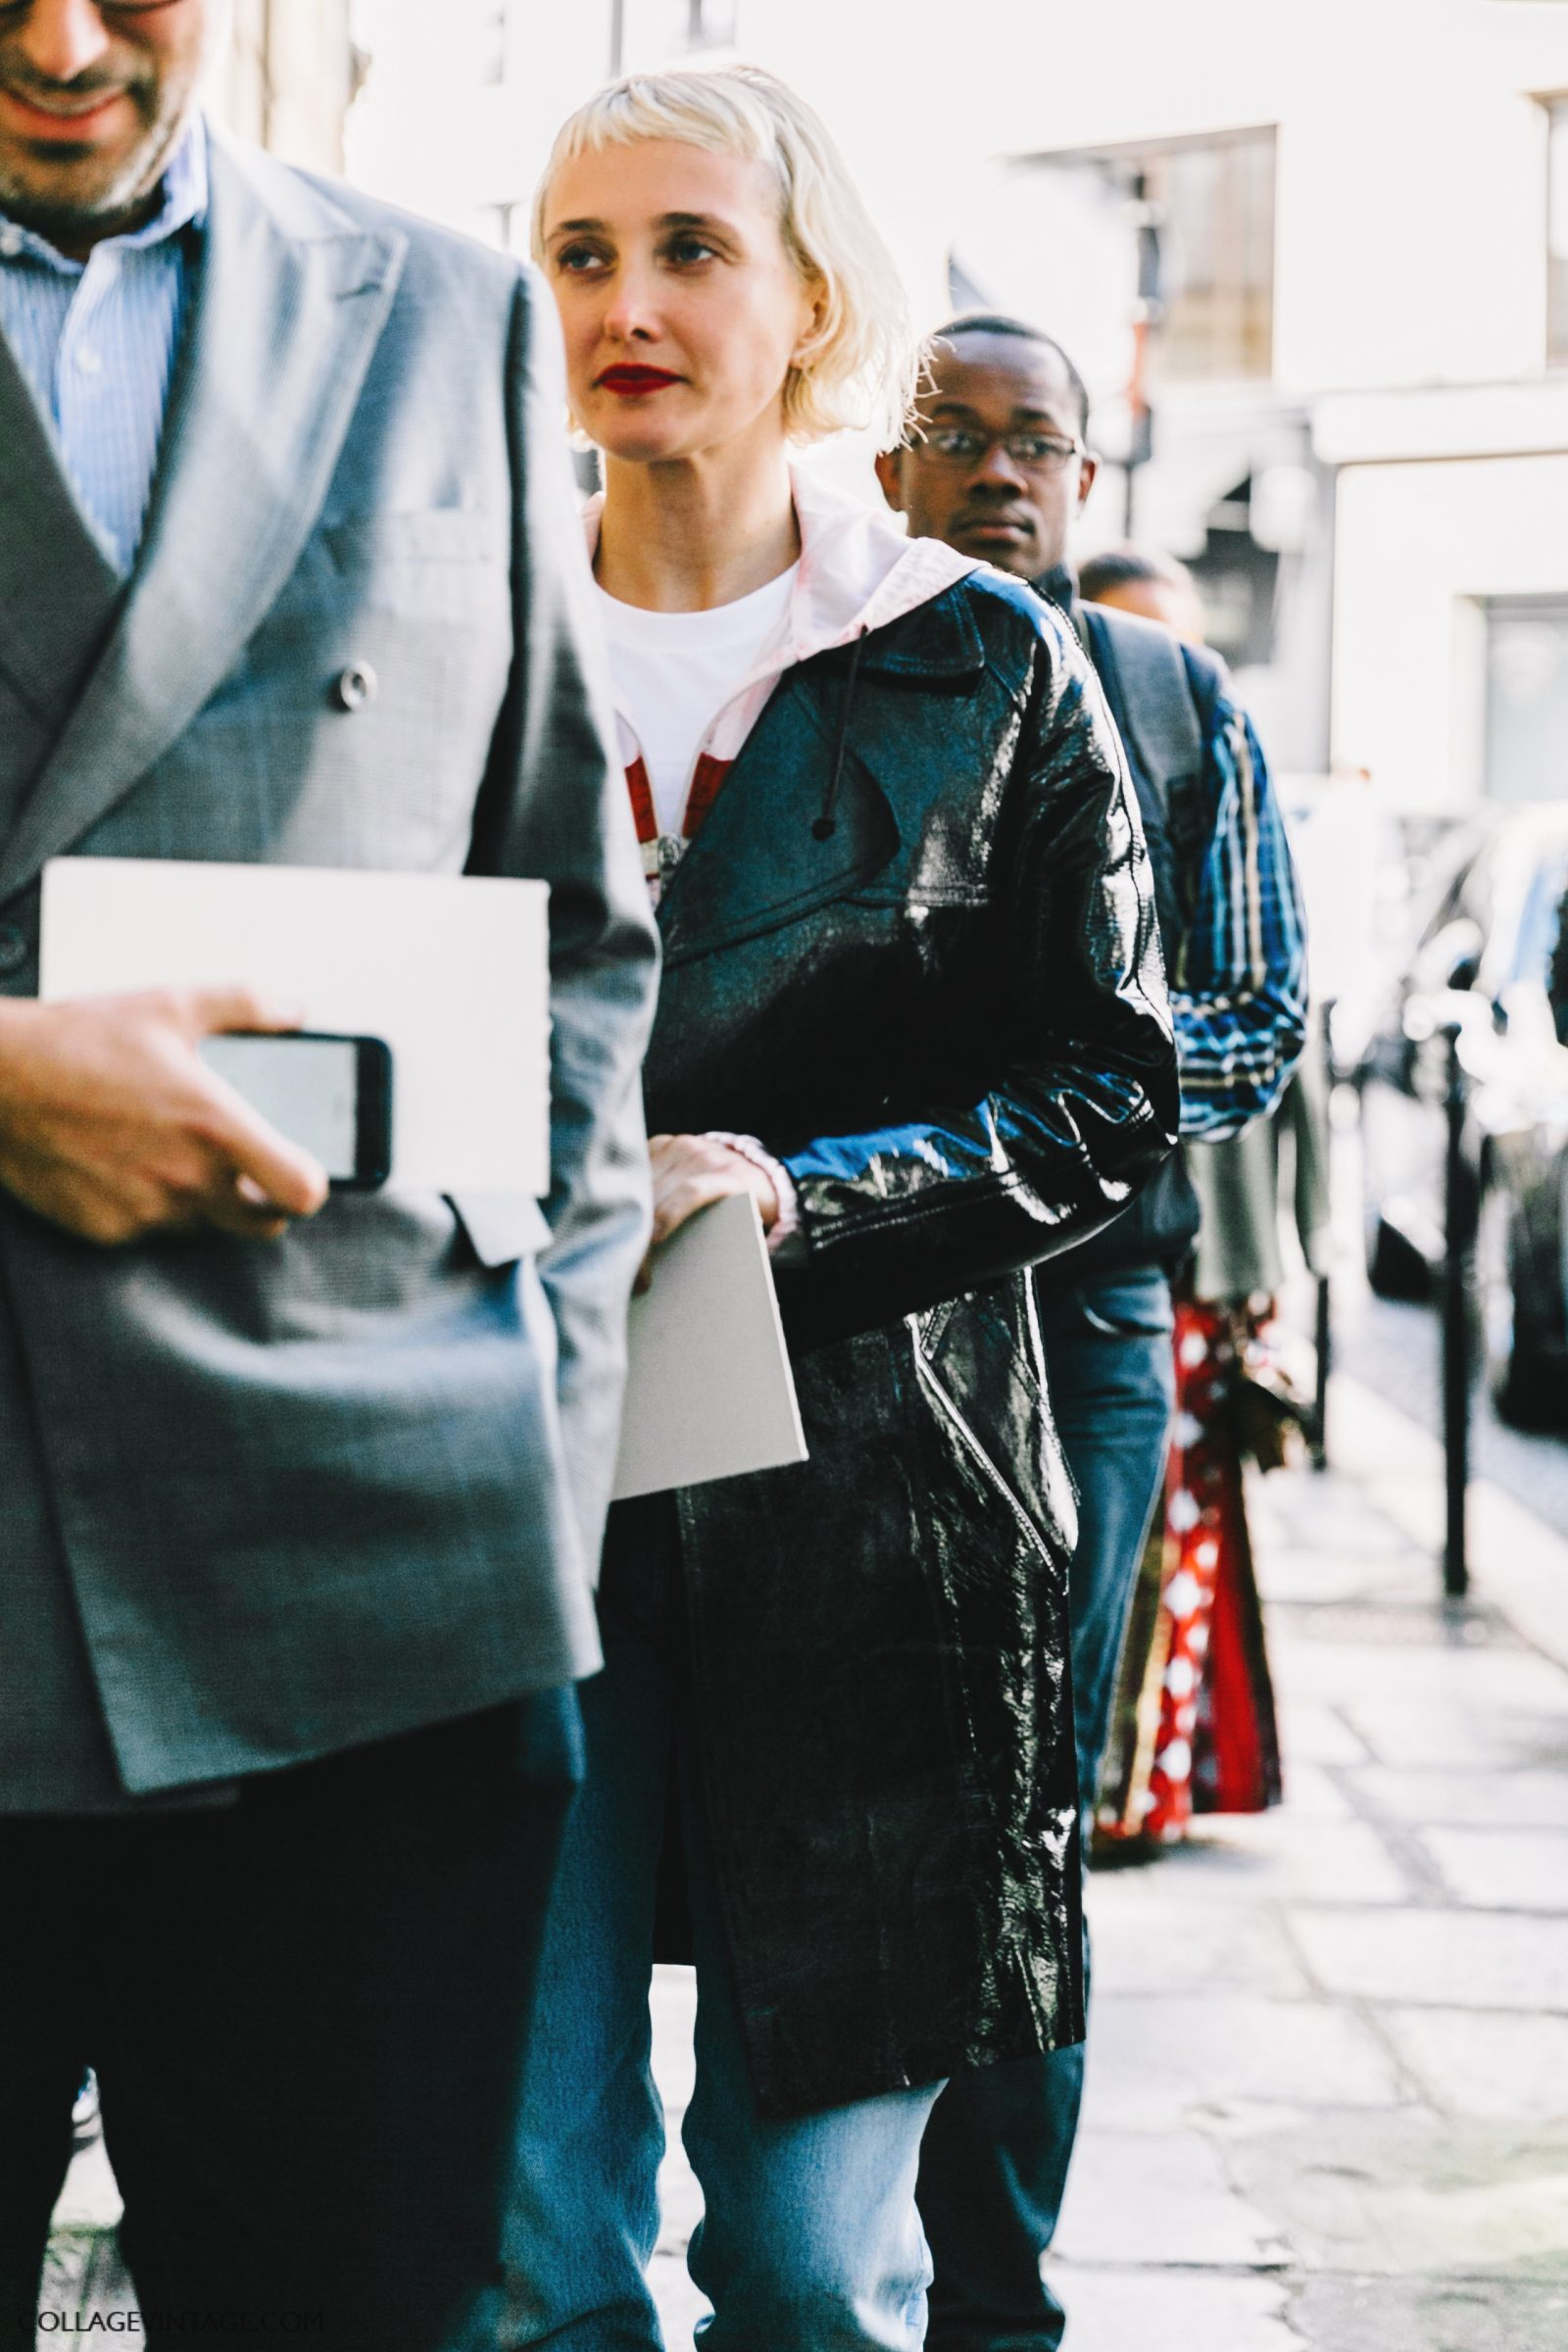 pfw-paris_fashion_week_ss17-street_style-outfits-collage_vintage-valentino-balenciaga-celine-108